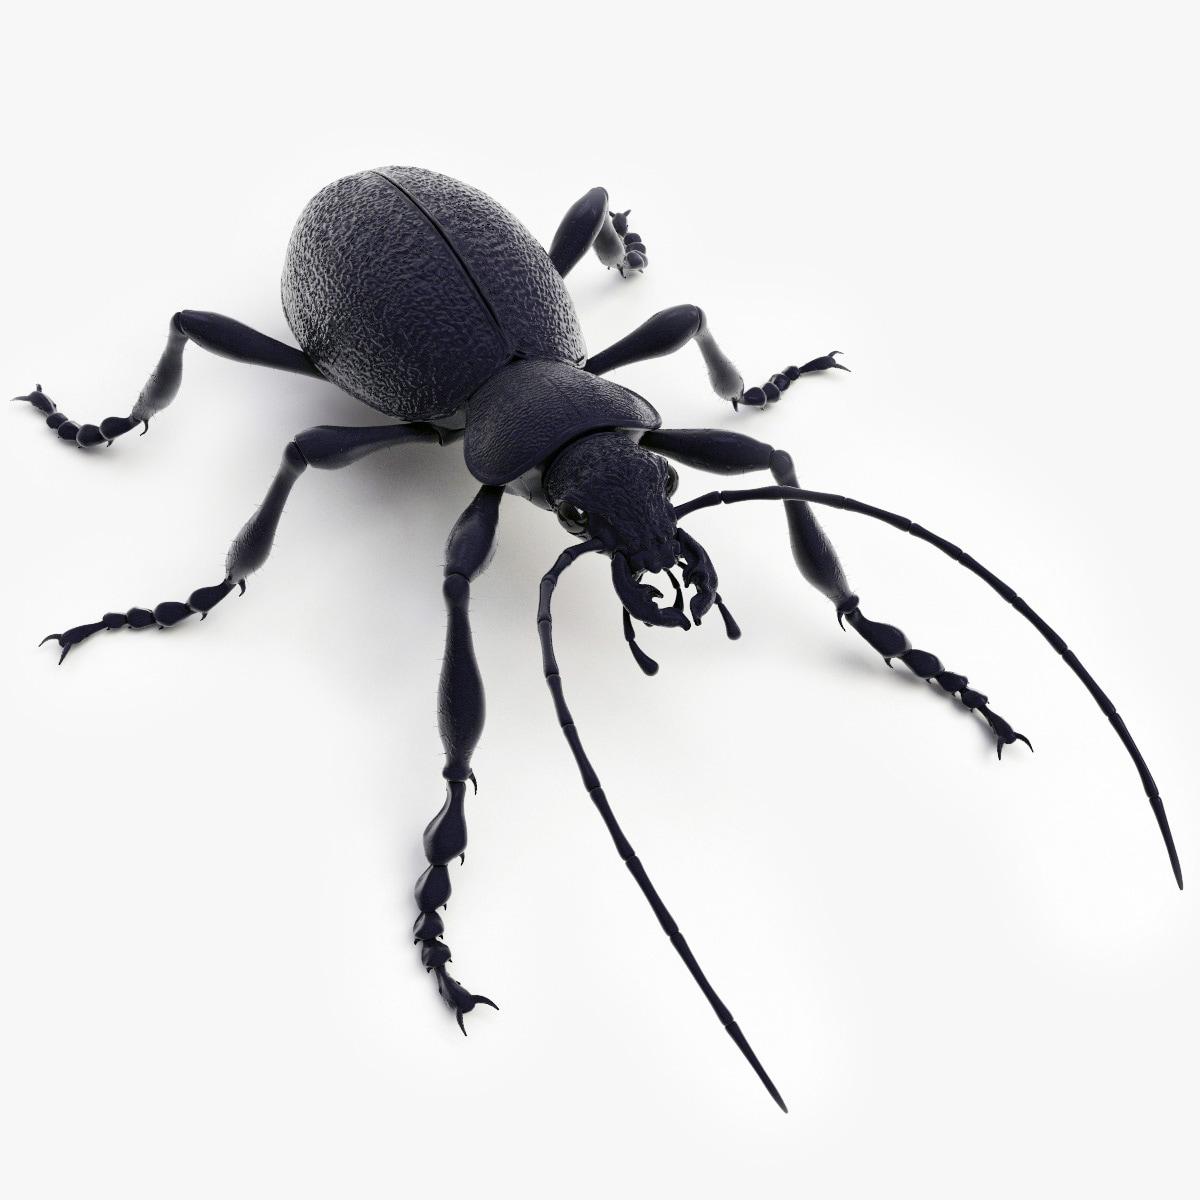 Ground_Beetle_00.jpg